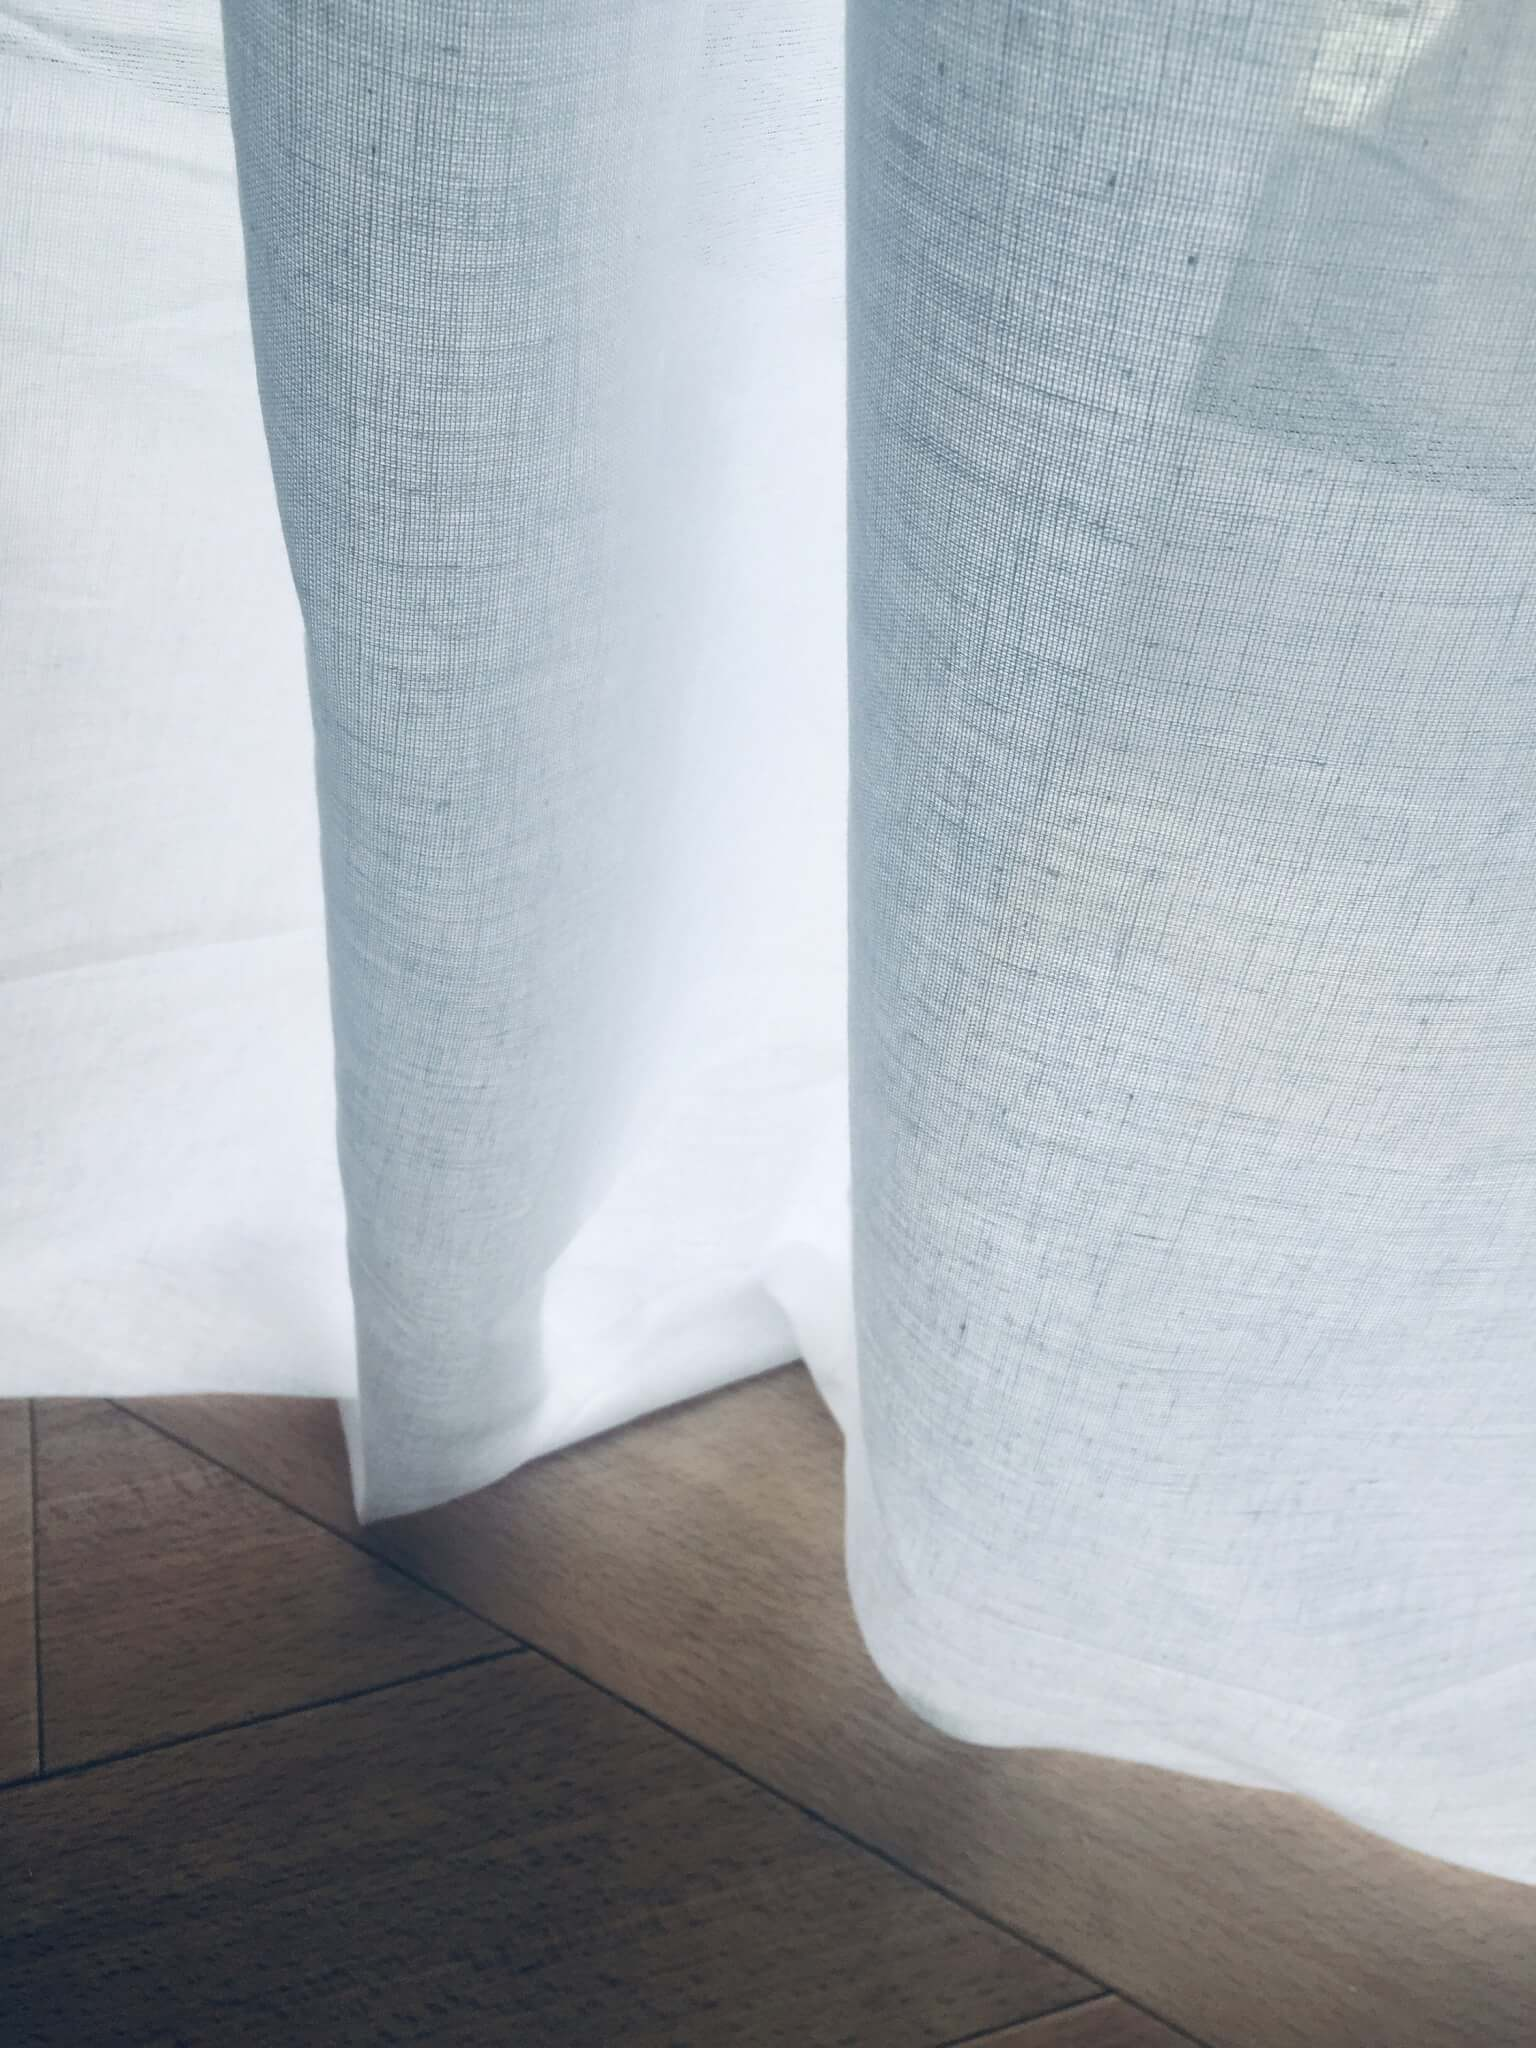 100-cotton-gauze-muslin-fabric-voile-curtains-fine-cheese-cloth-linen-look-event-decoration-wedding-textile-245cm-extra-wide-white-5da201781.jpg